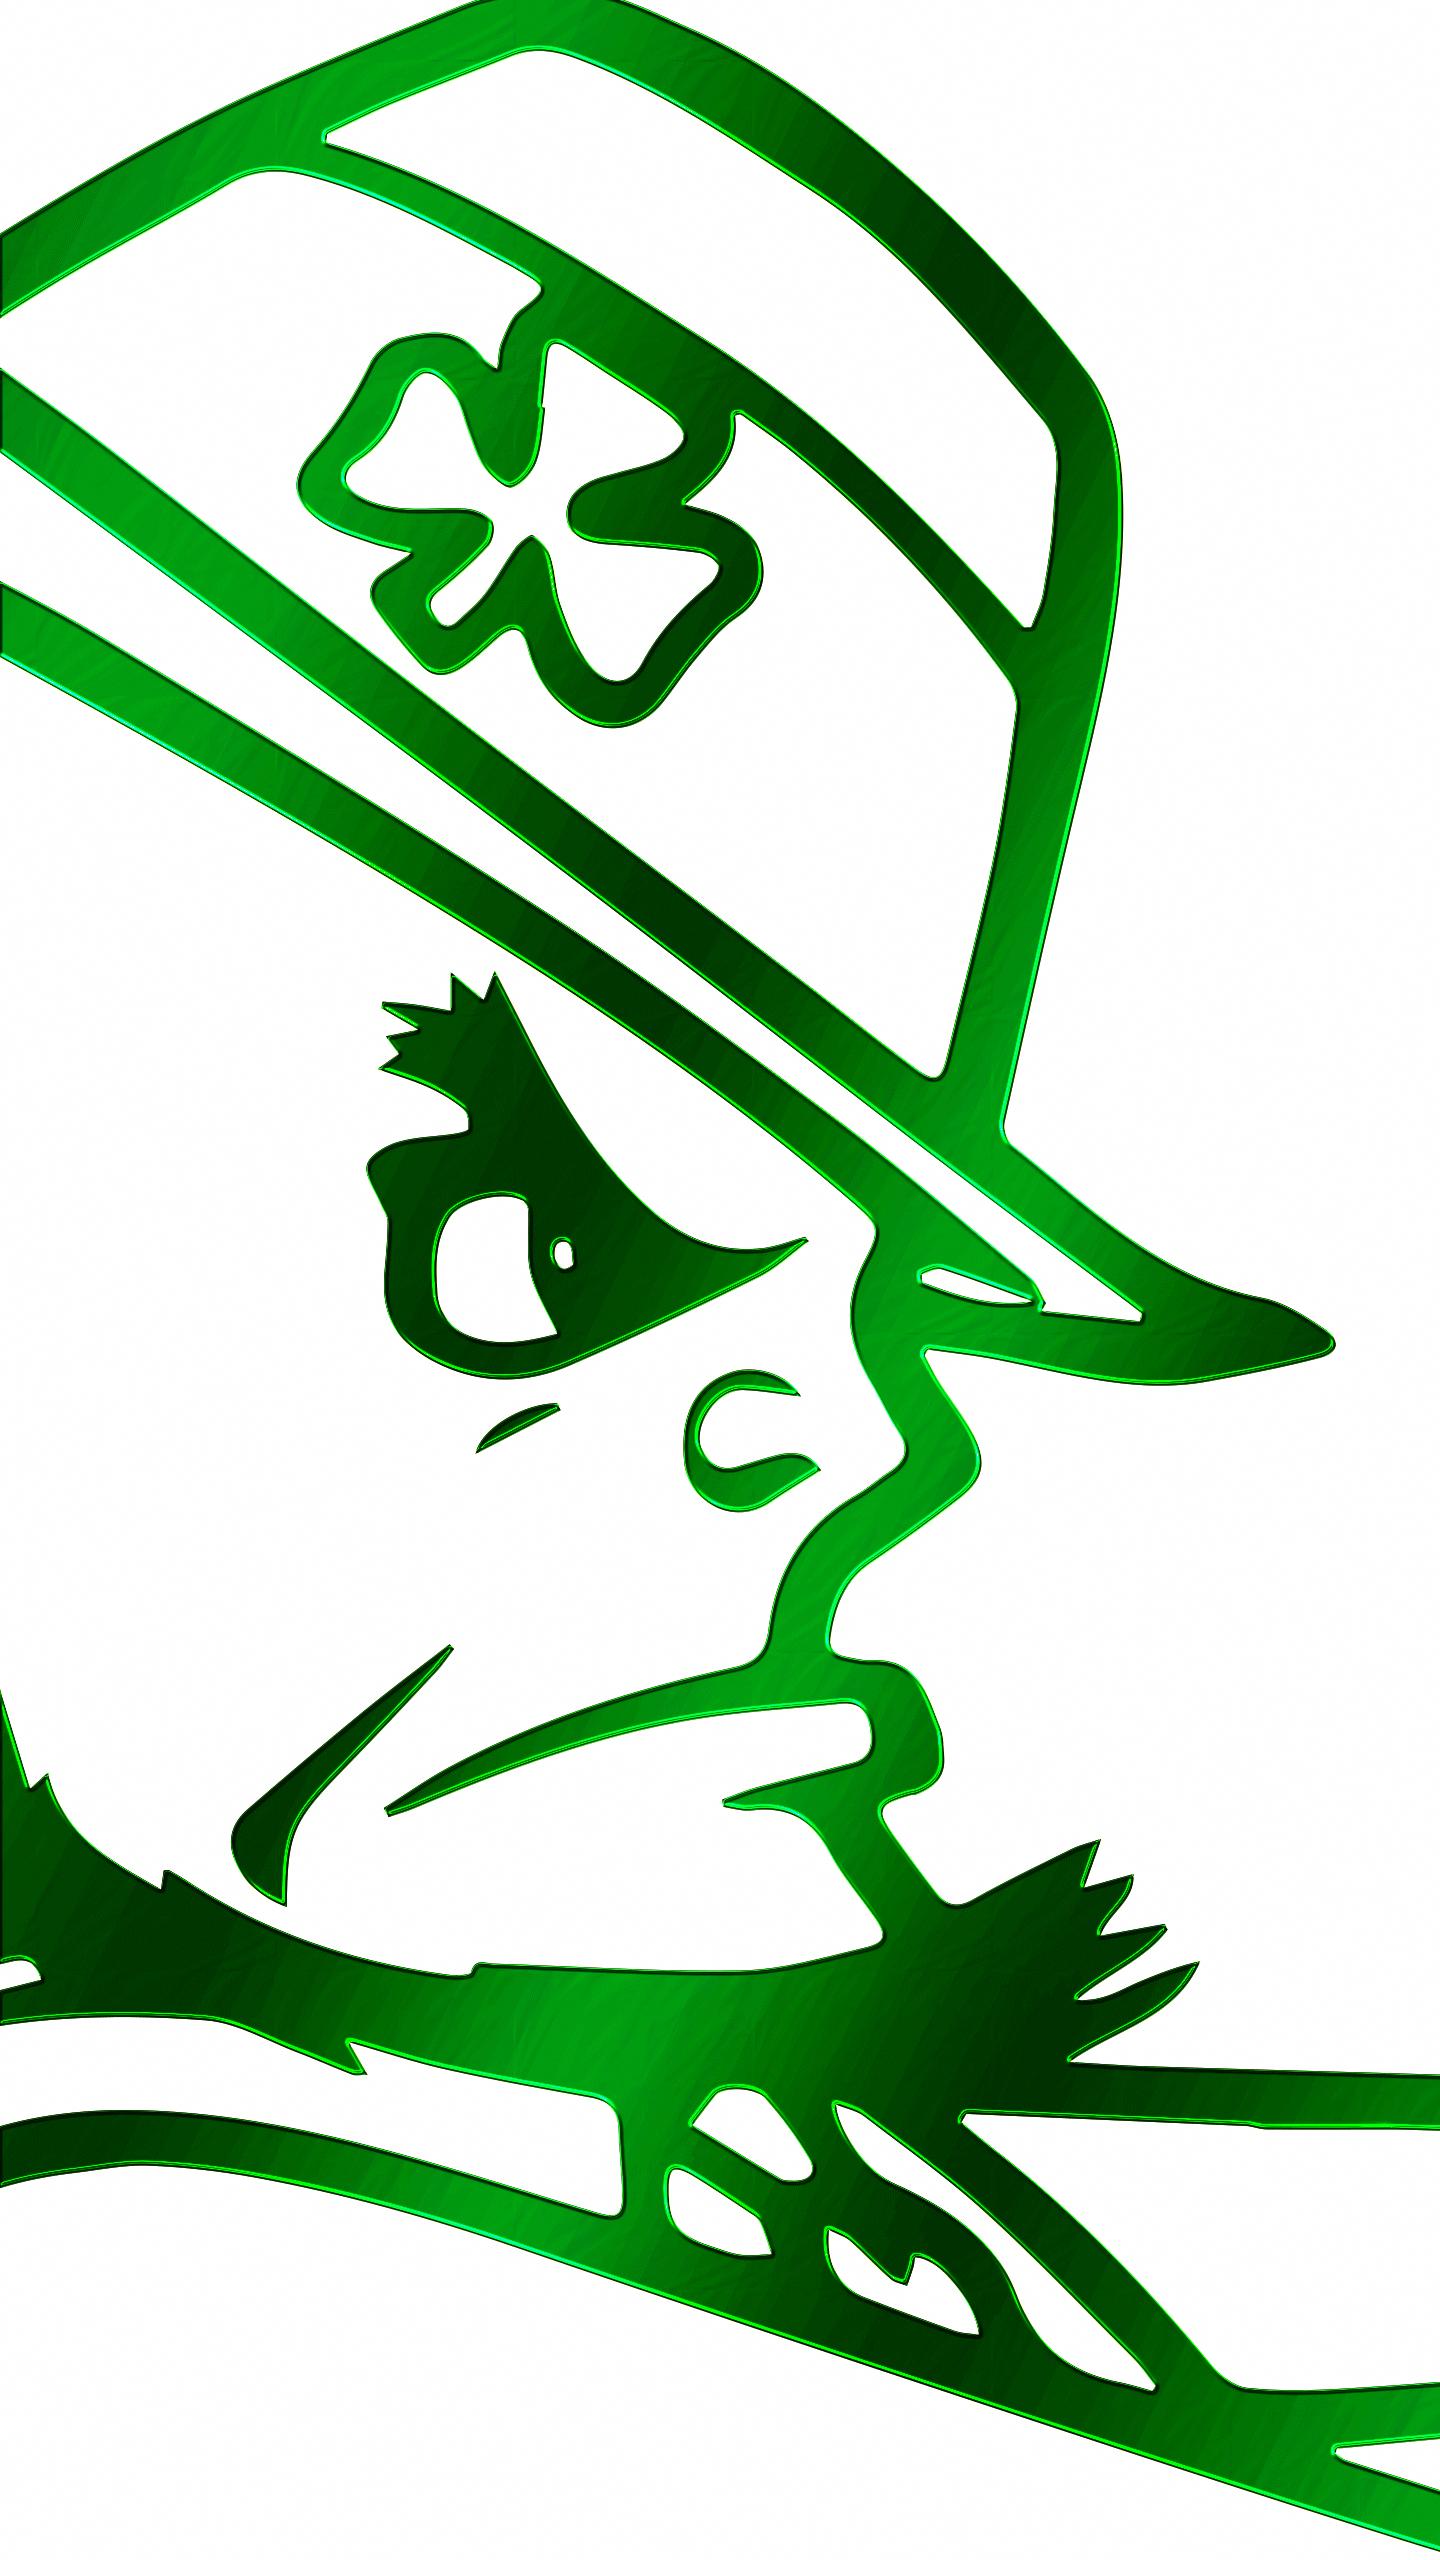 Nd football green clipart jpg library download BabyFoodTipsKannada #Sims3Ps3GardeningTips | IU stuff | Notre dame ... jpg library download